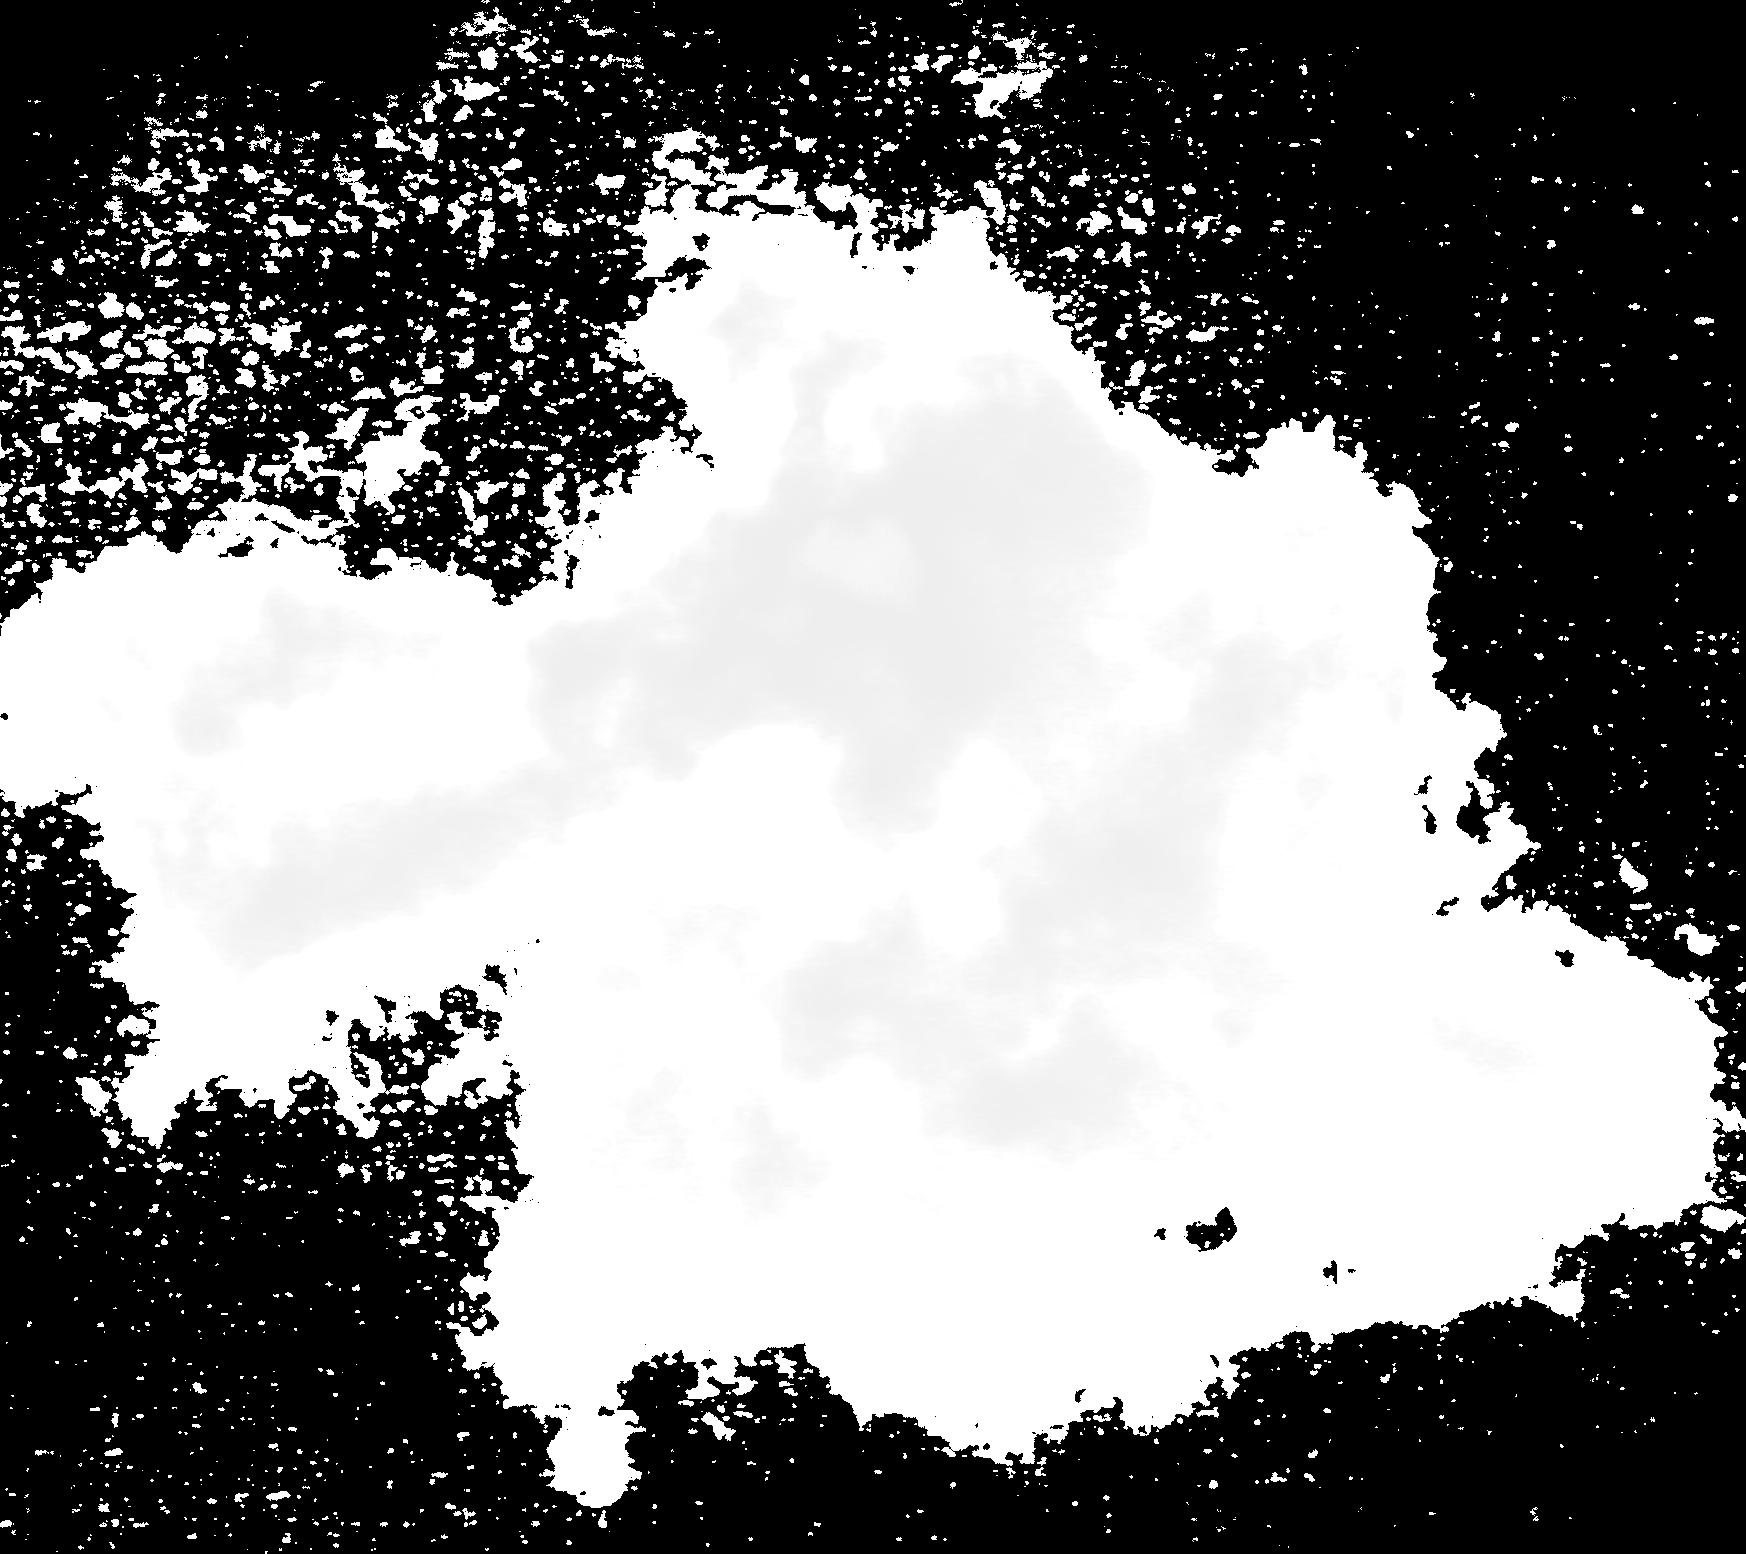 cloud transparent tumblr for - photo #34